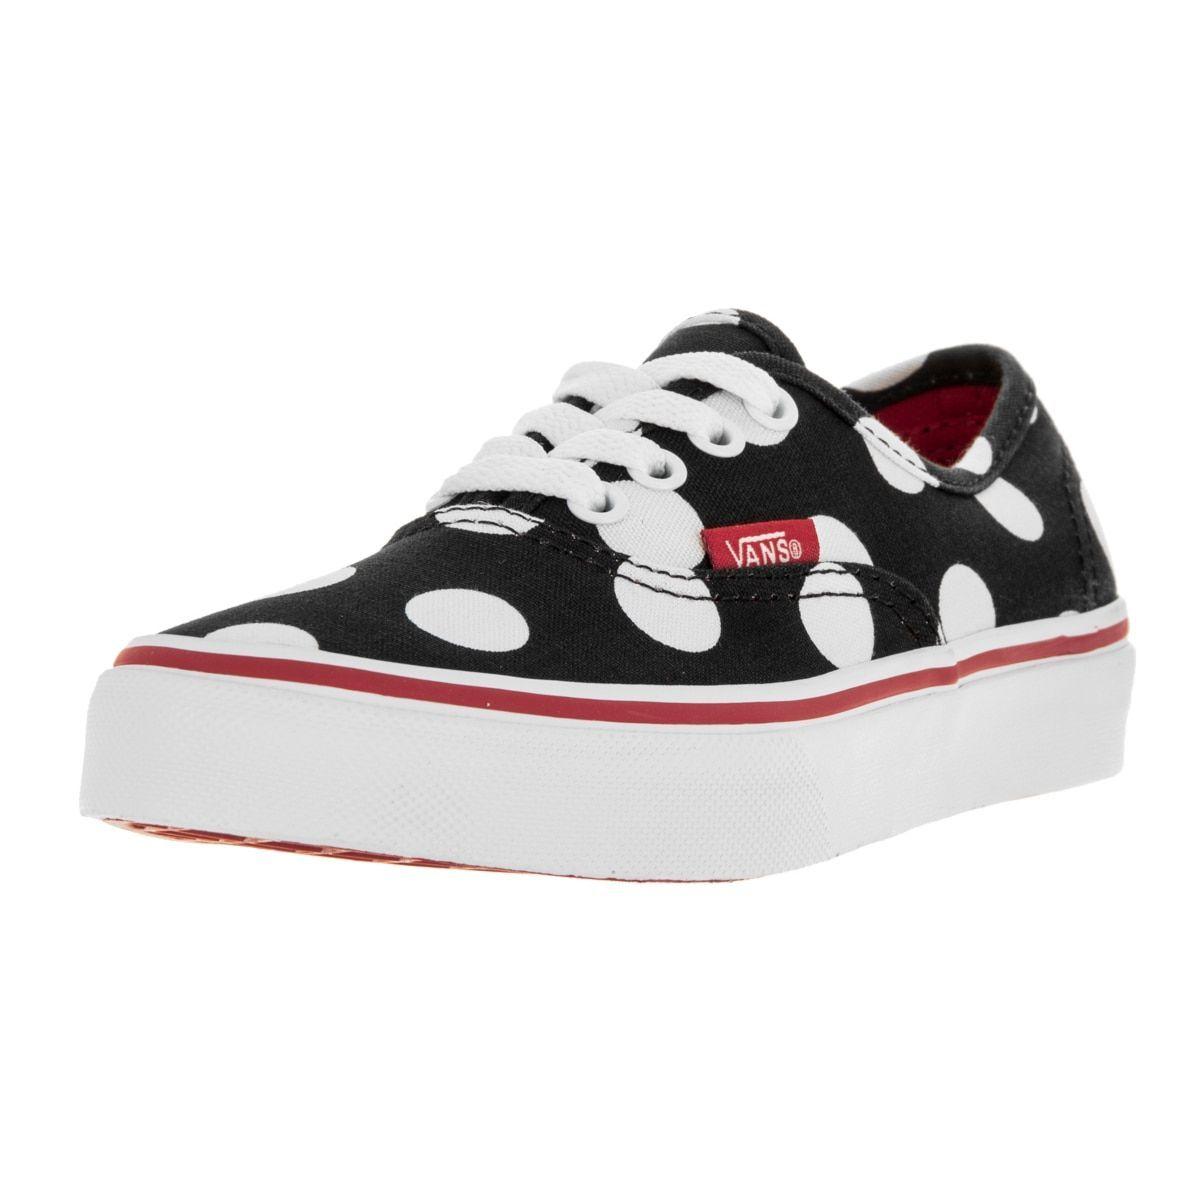 8ec062ab3b Vans Kids Black Red White Canvas Polka Dot Skate Shoe (2)